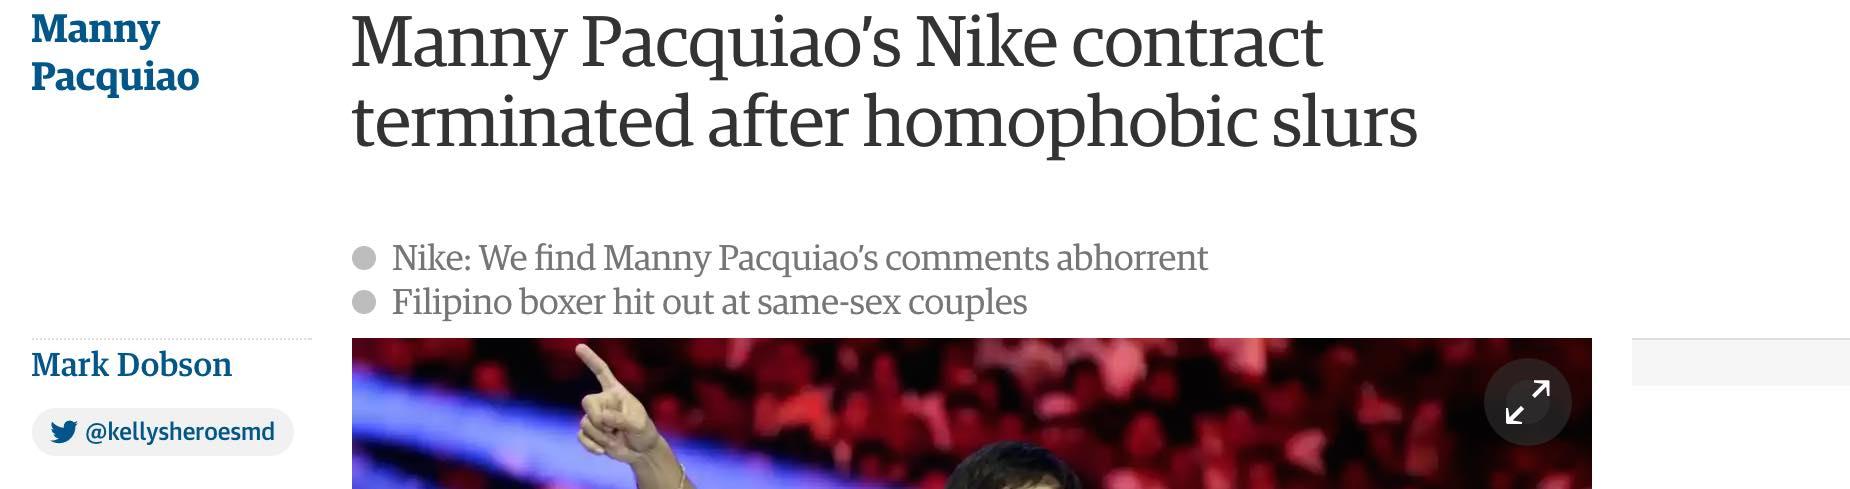 Manny Pacquiao - Cancel Nike